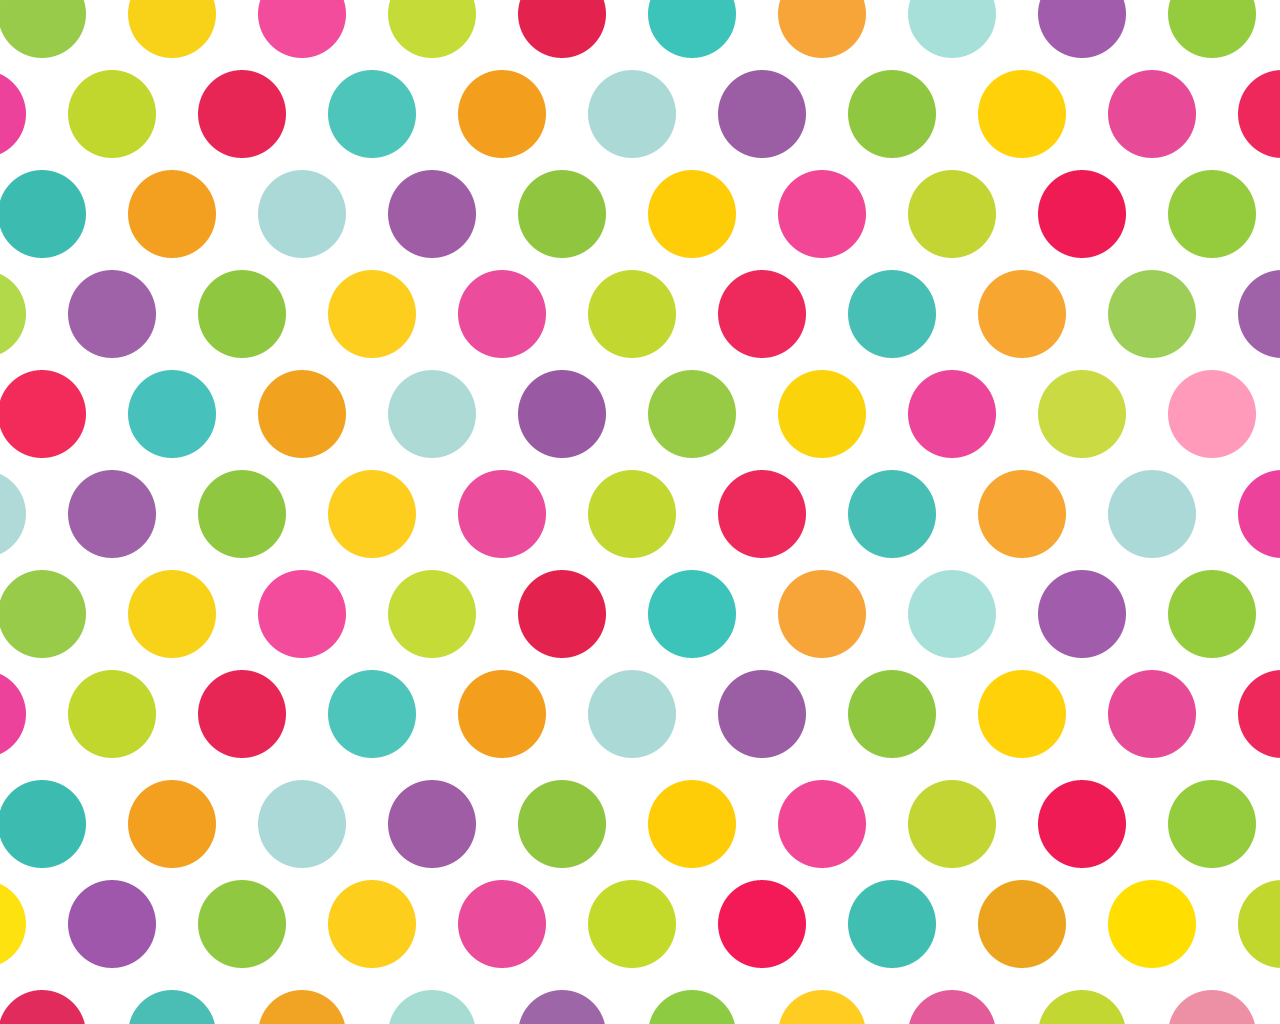 polka-dot-wallpapers-colorful